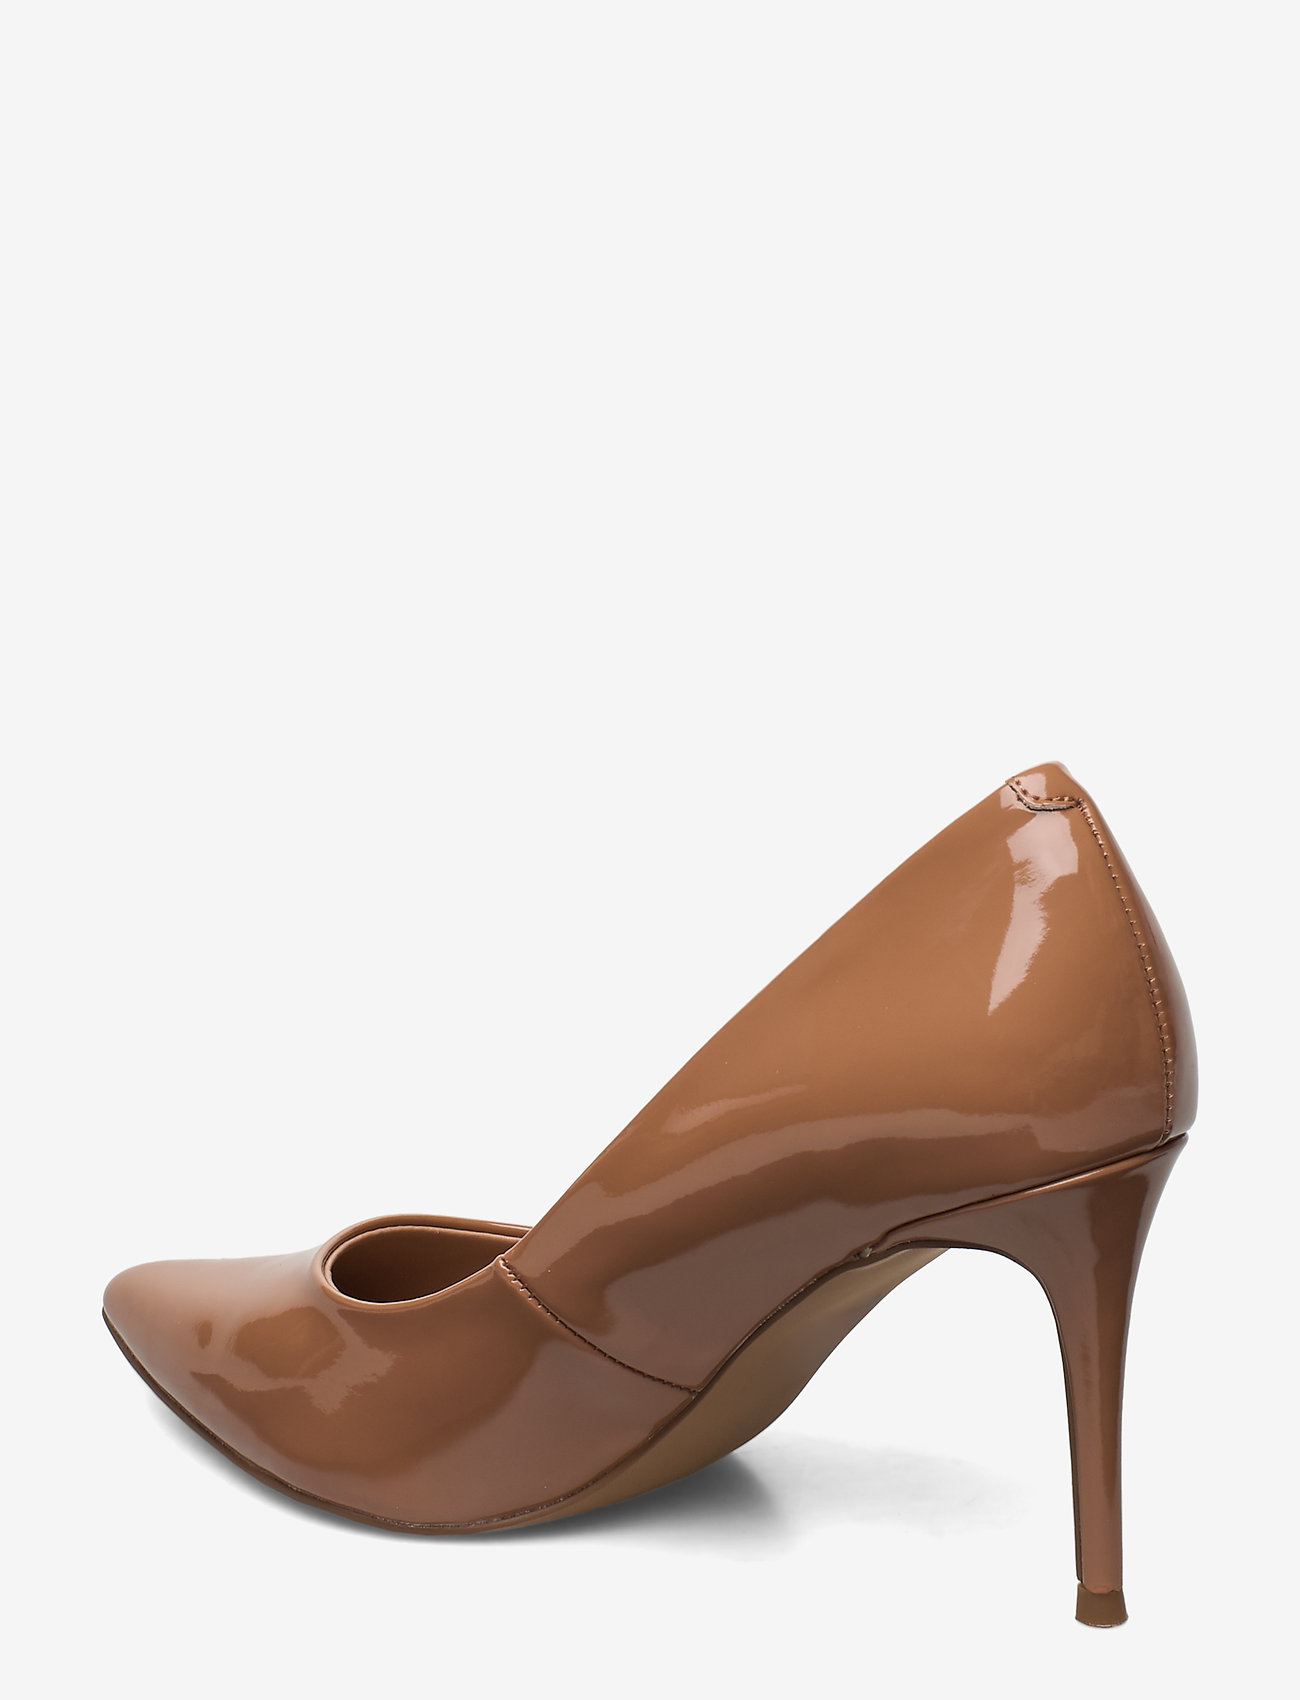 Lillie Pump (Camel Patent) - Steve Madden